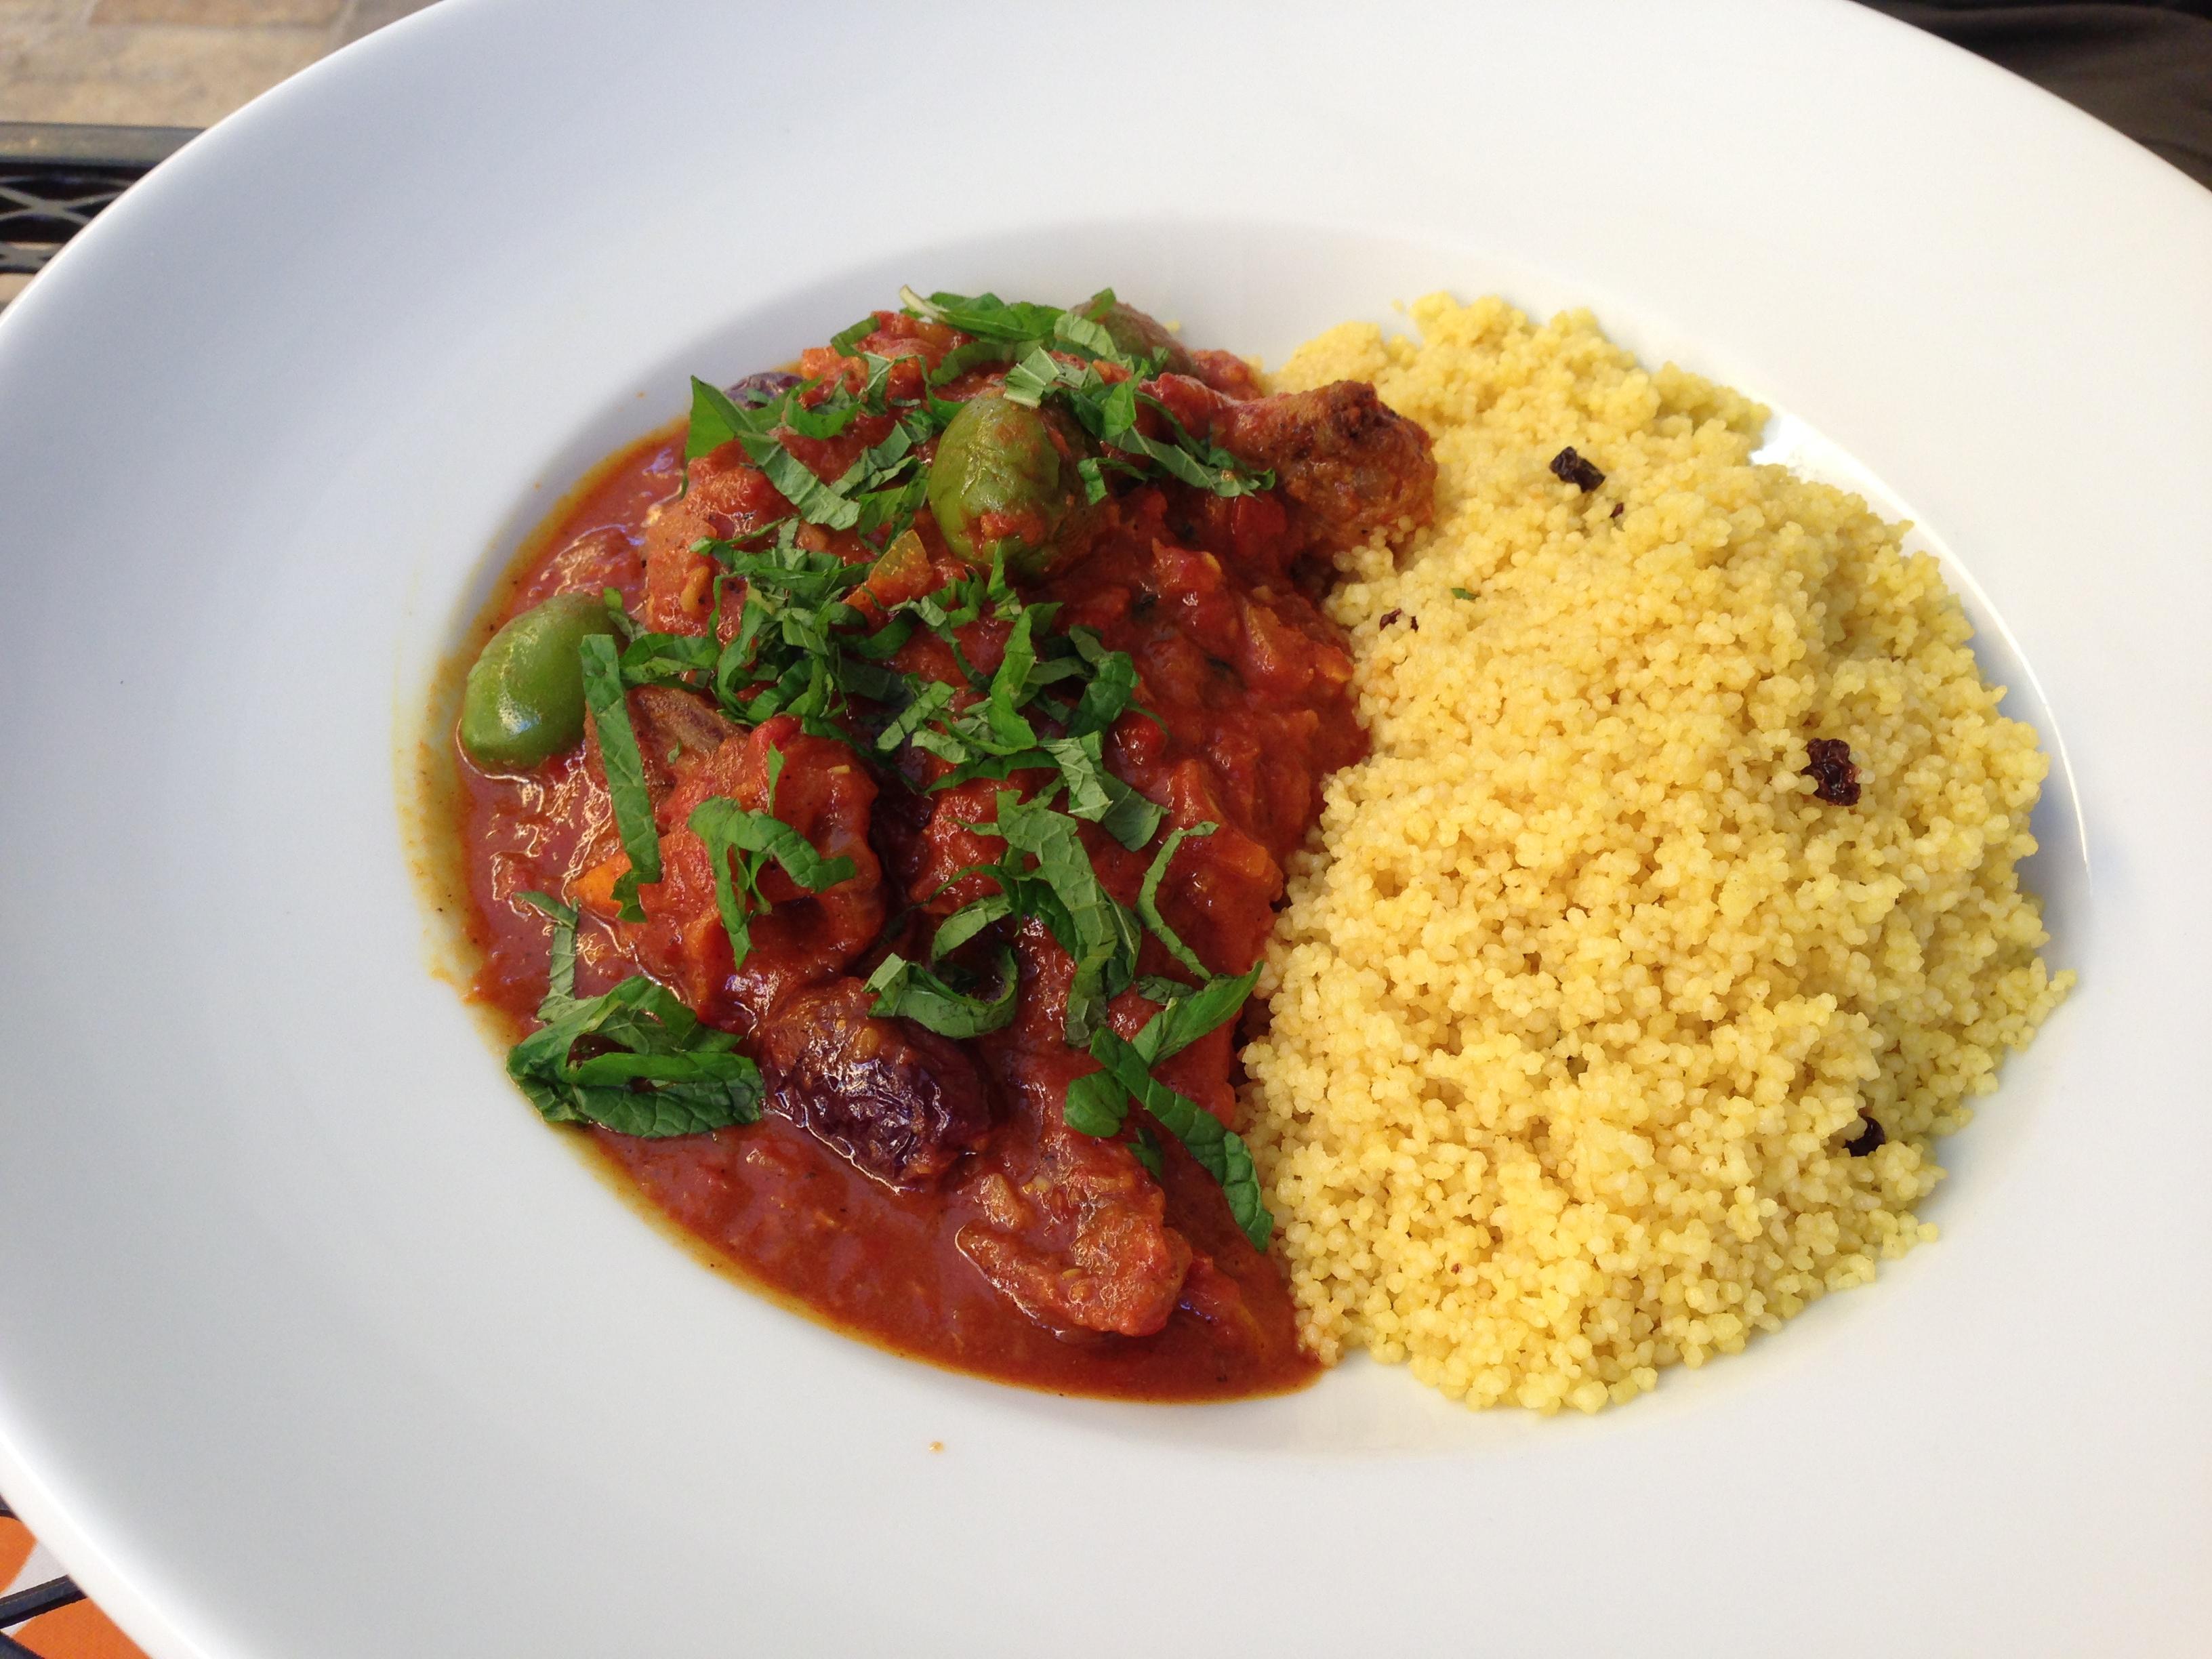 Moroccan chicken tajine at Hanna's Gourmet